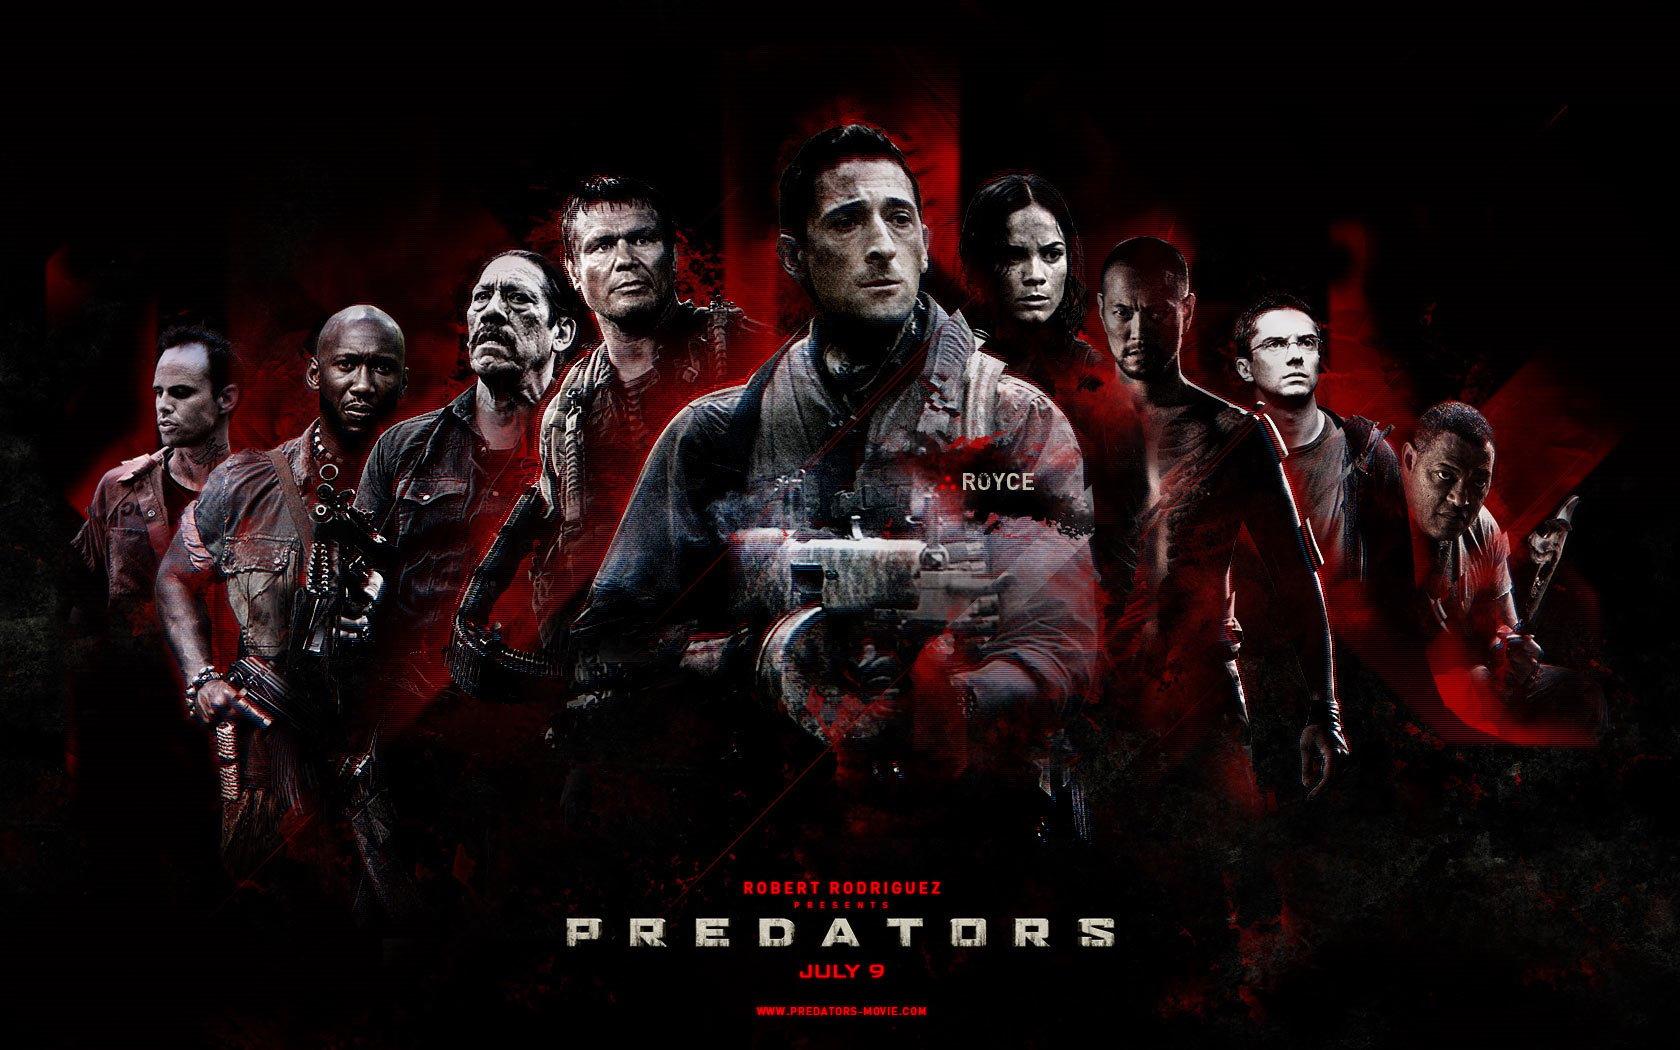 Predators Wallpaper and Background Image 1680x1050 ID513915 1680x1050